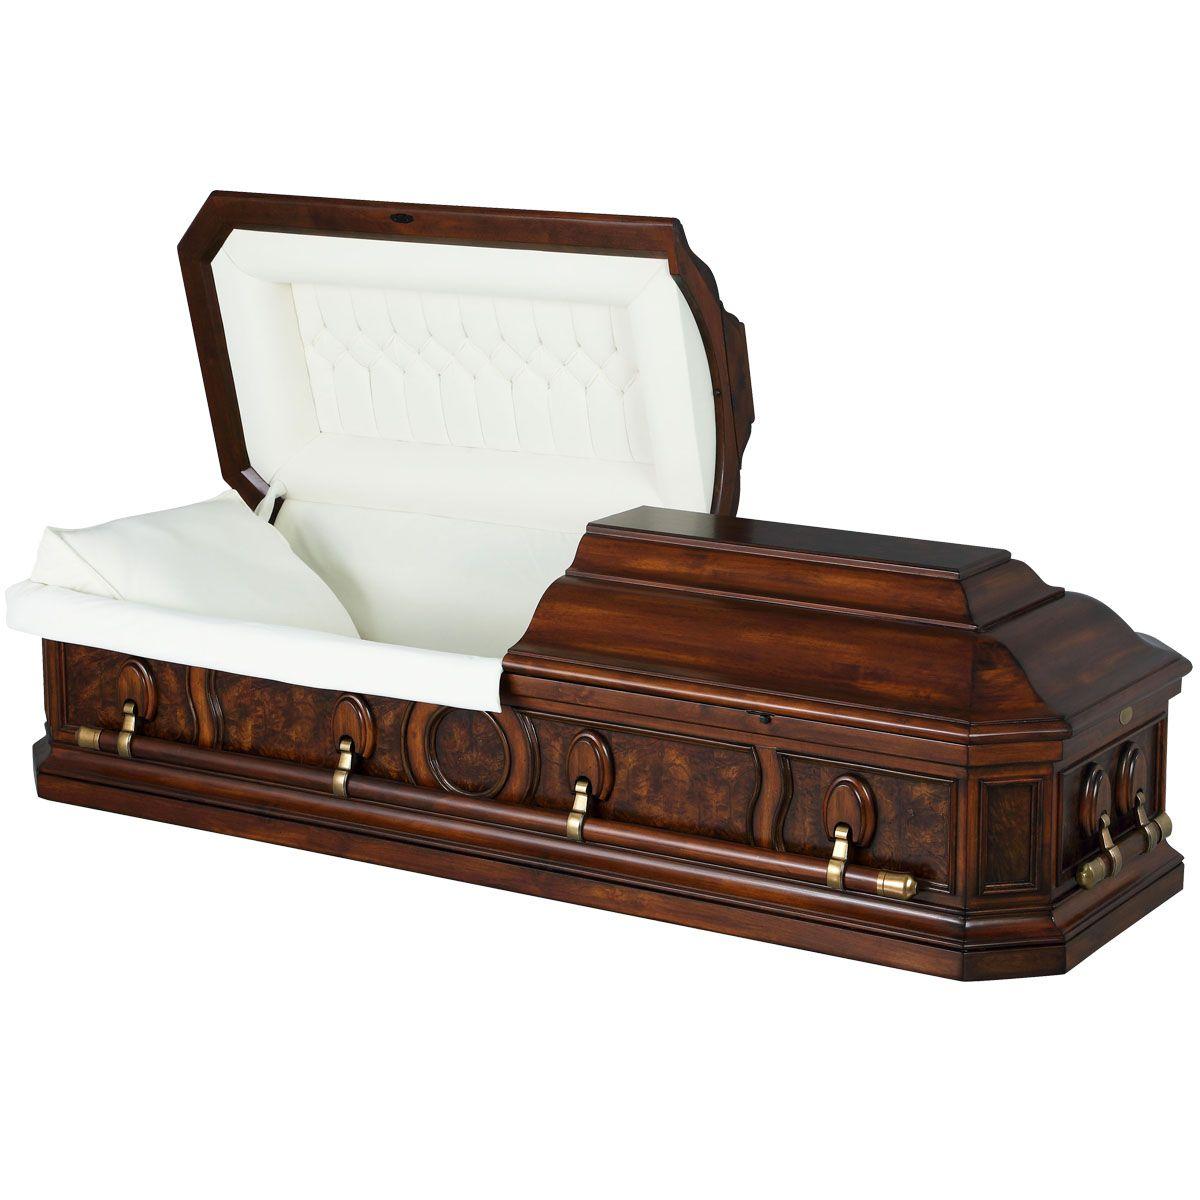 Belgrave Wooden American Casket Coffin Compare The